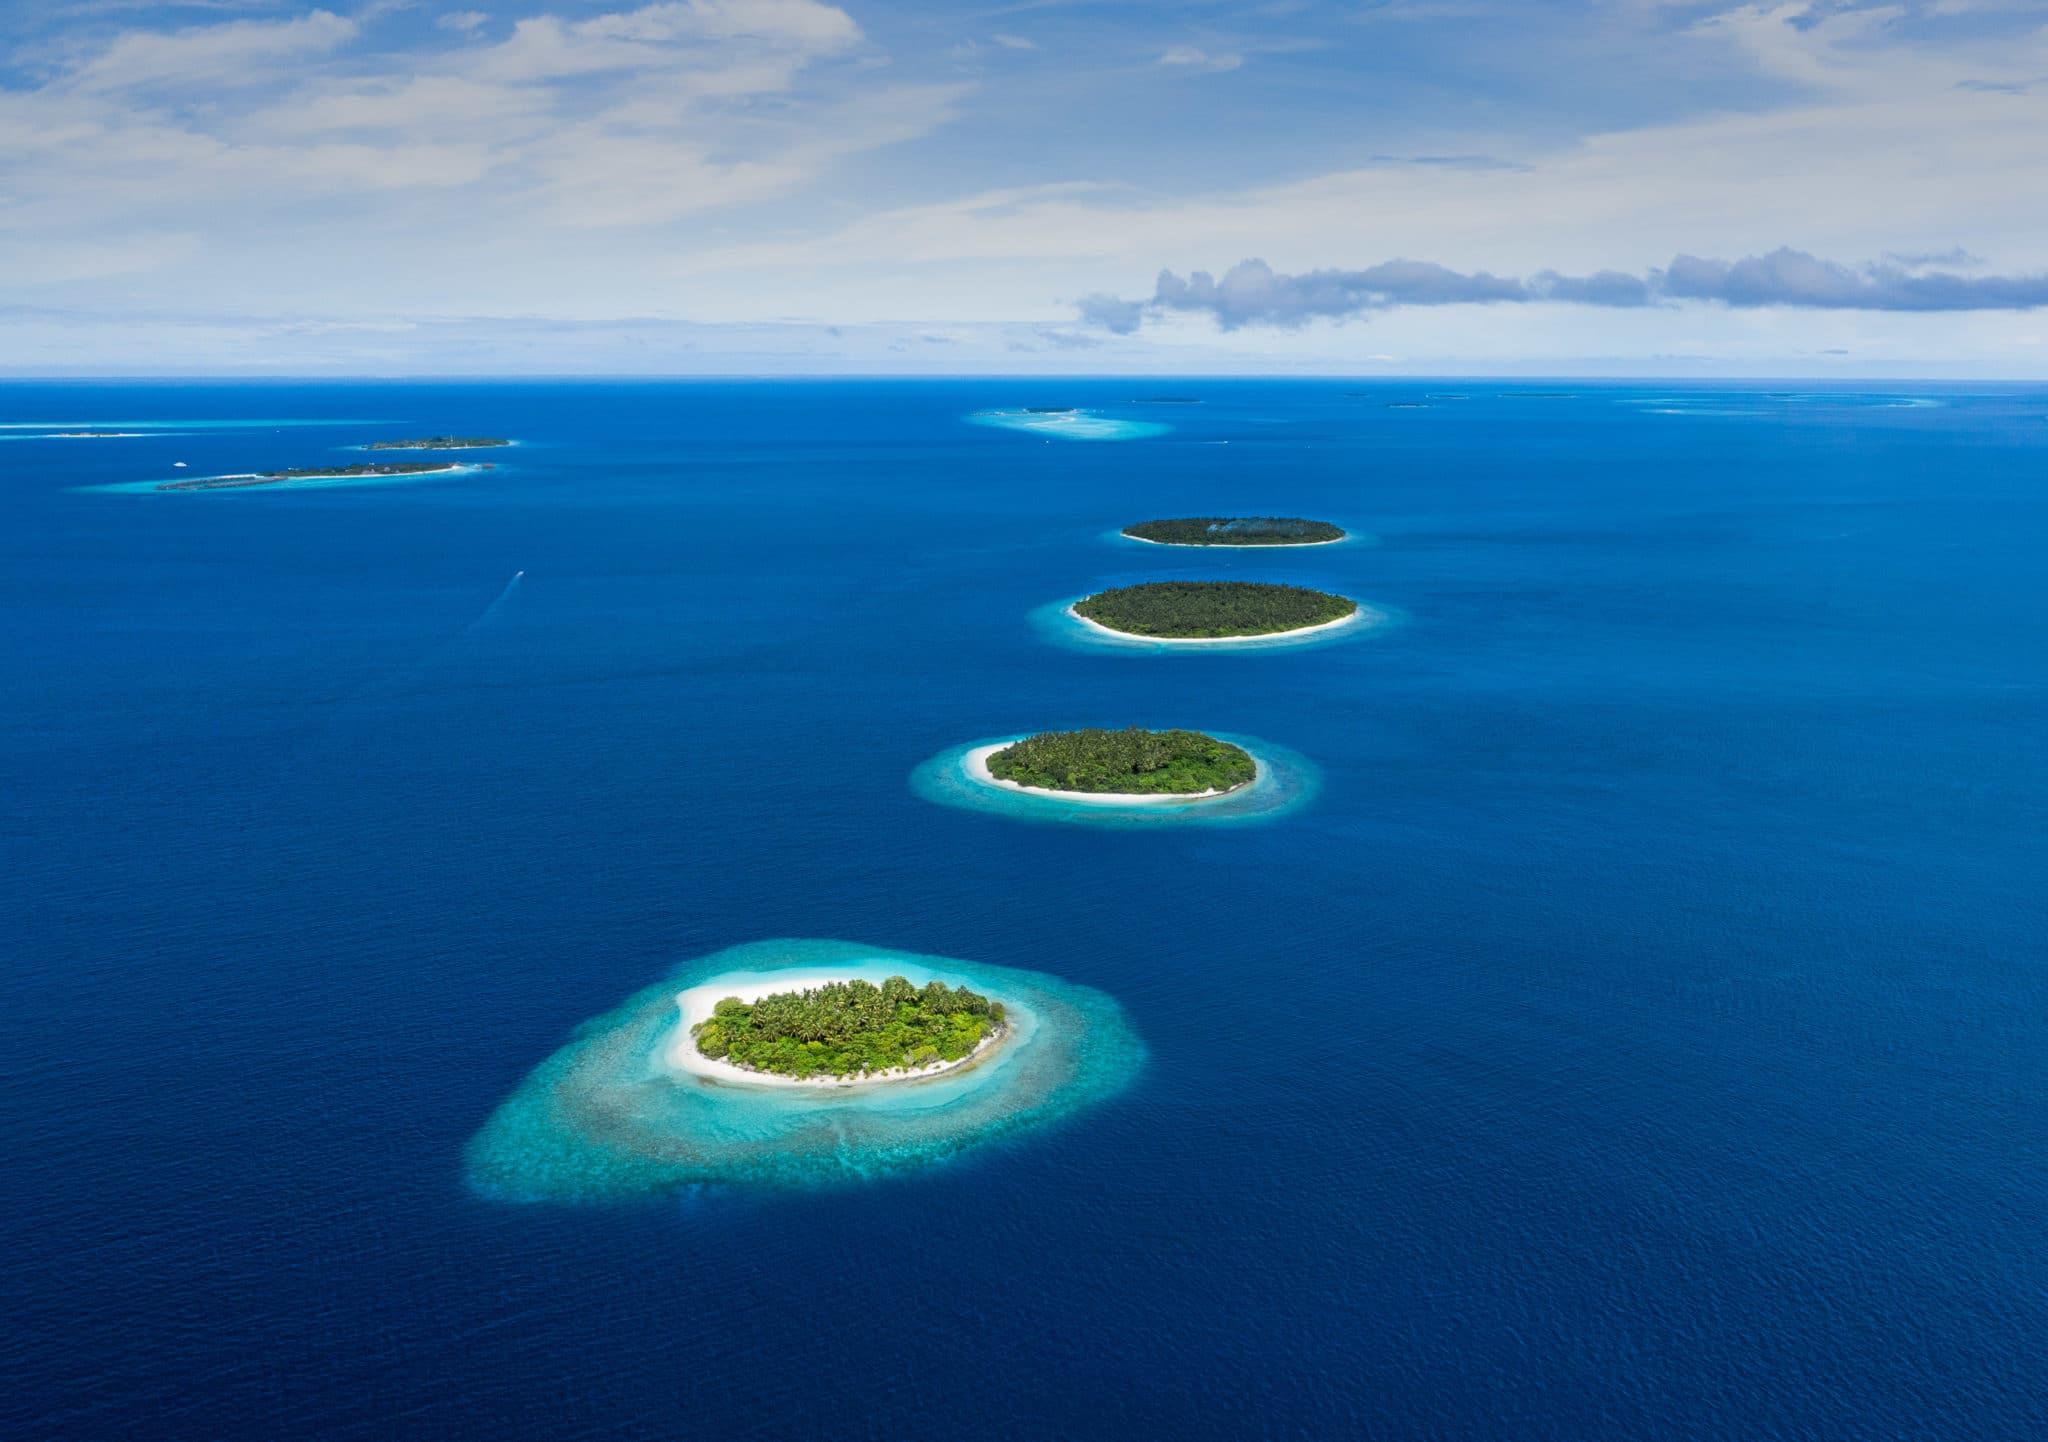 Maldives: The perfect island getaway